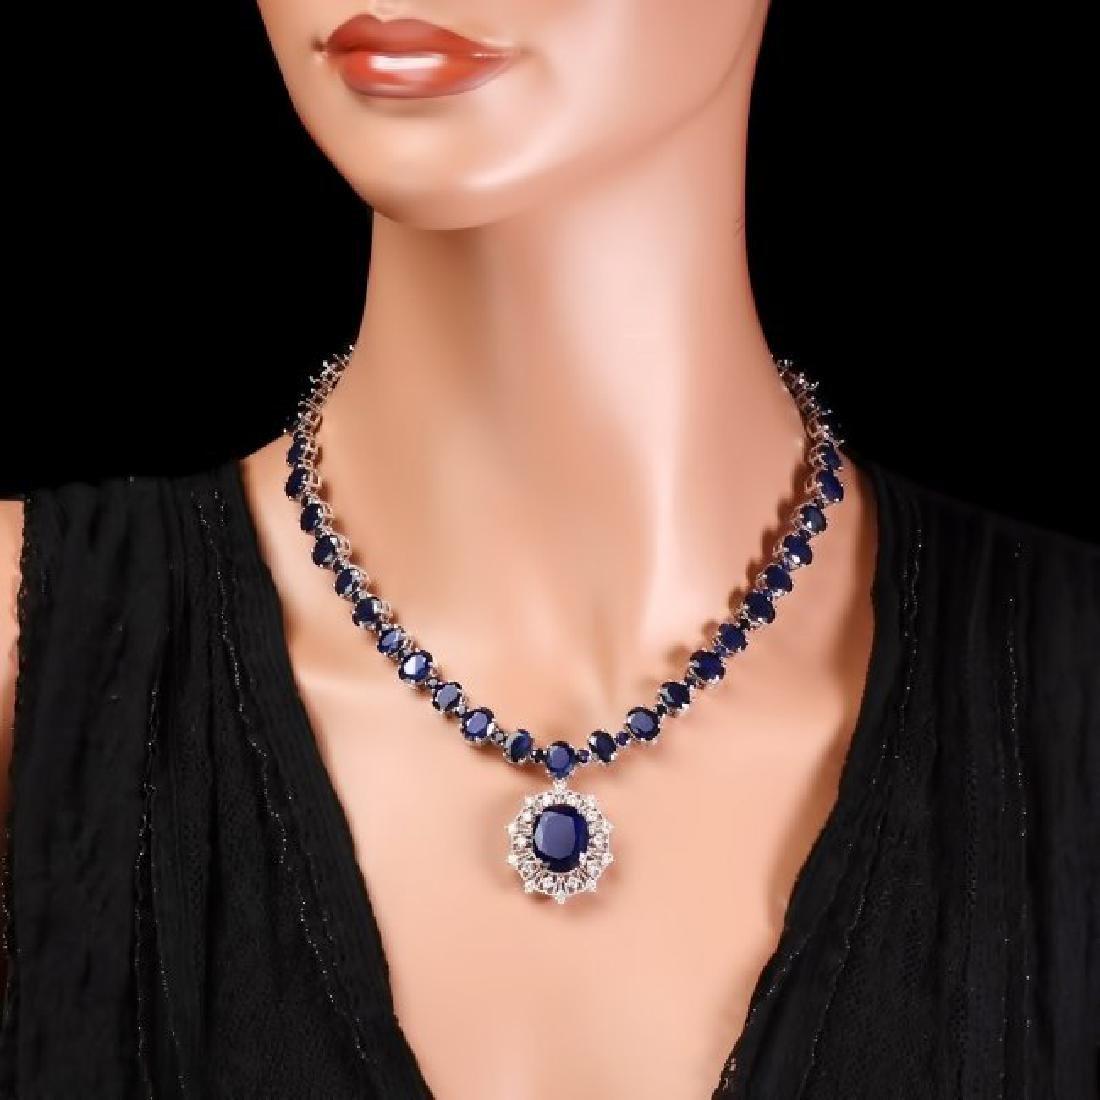 14k Gold 86ct Sapphire 1.40ct Diamond Necklace - 4